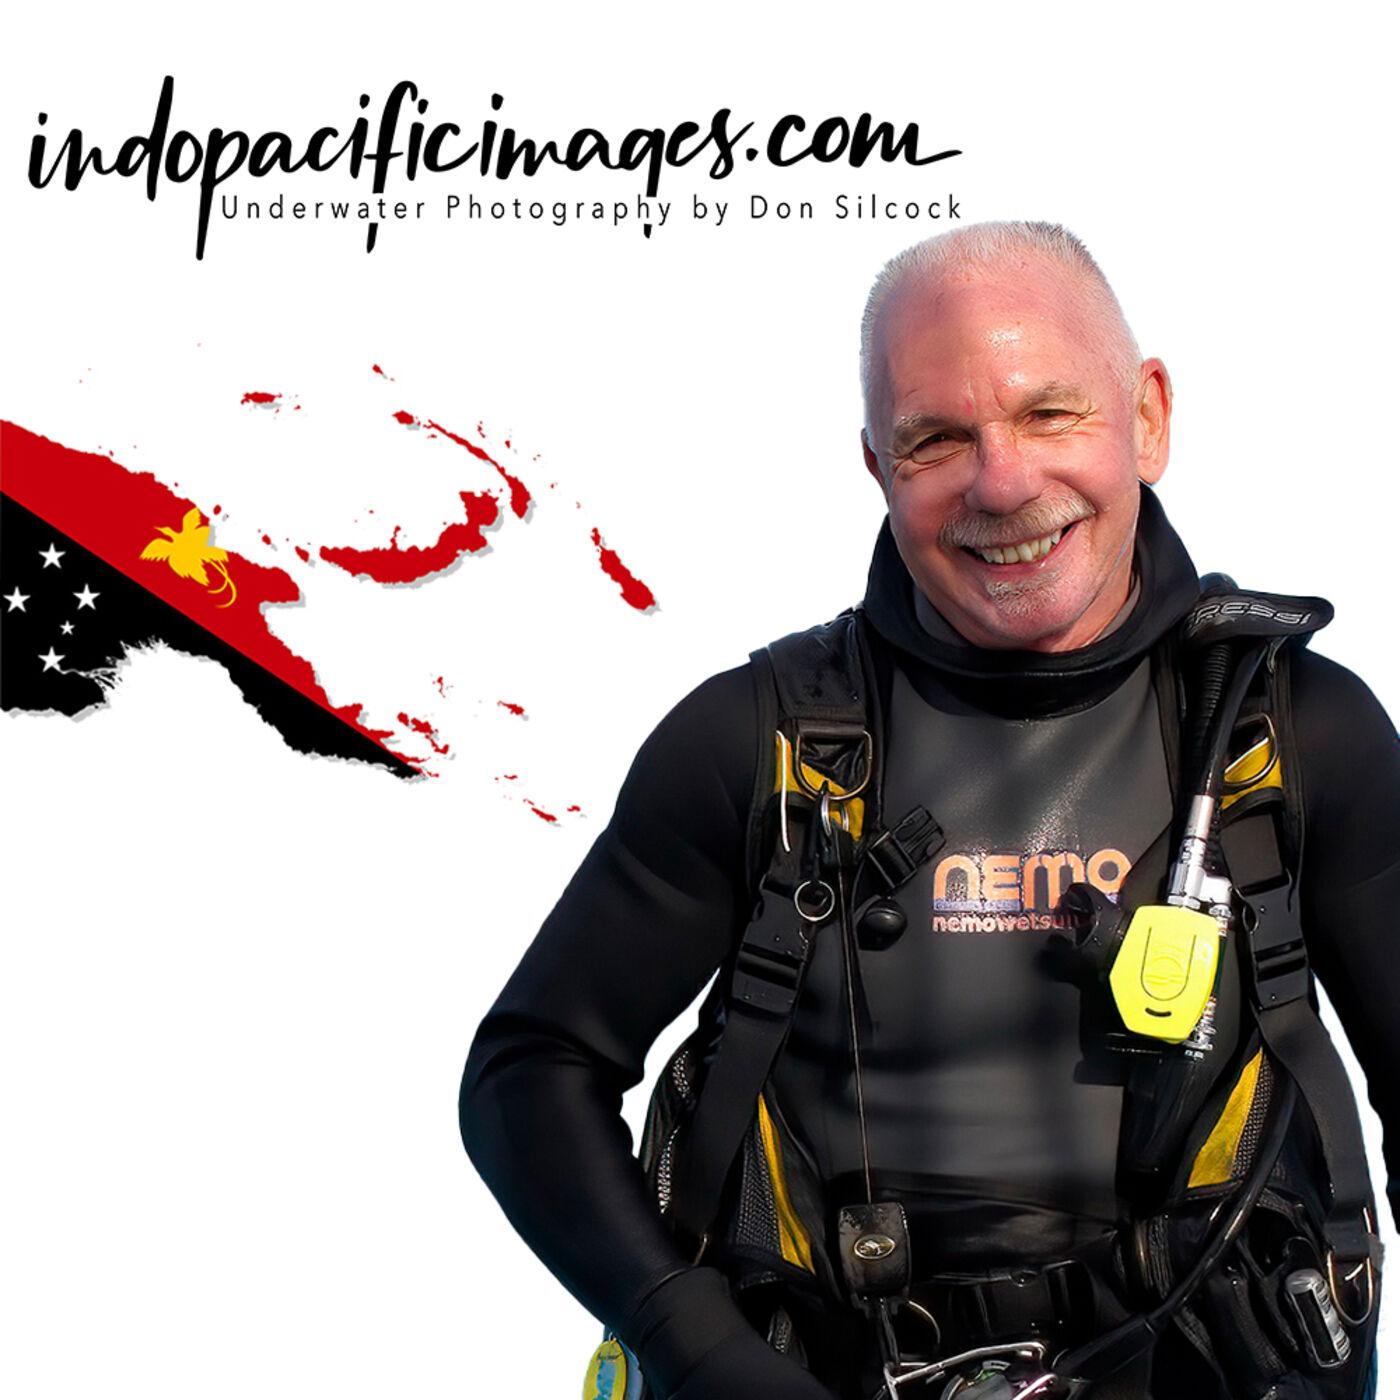 Don Silcock - Papua New Guinea - S01 E16